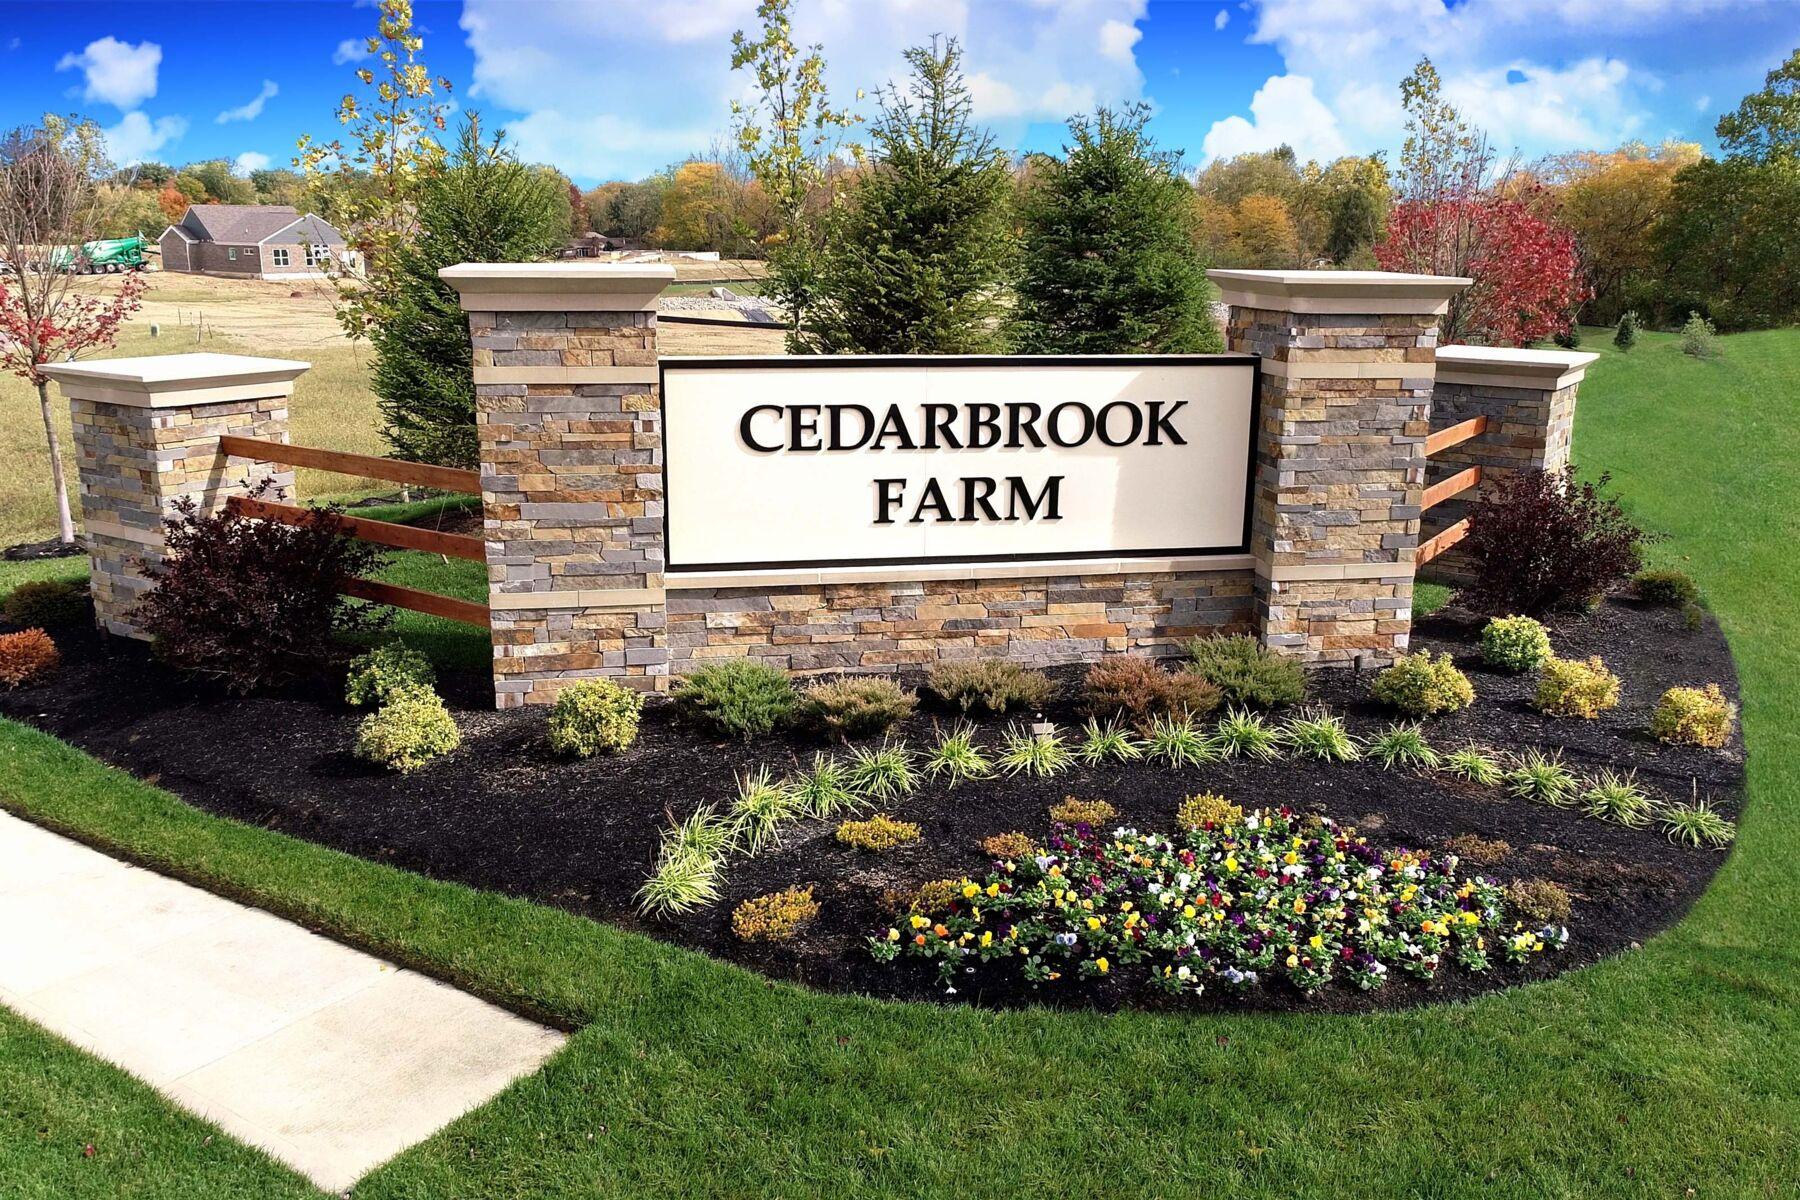 Cedarbrook Farm Entrance